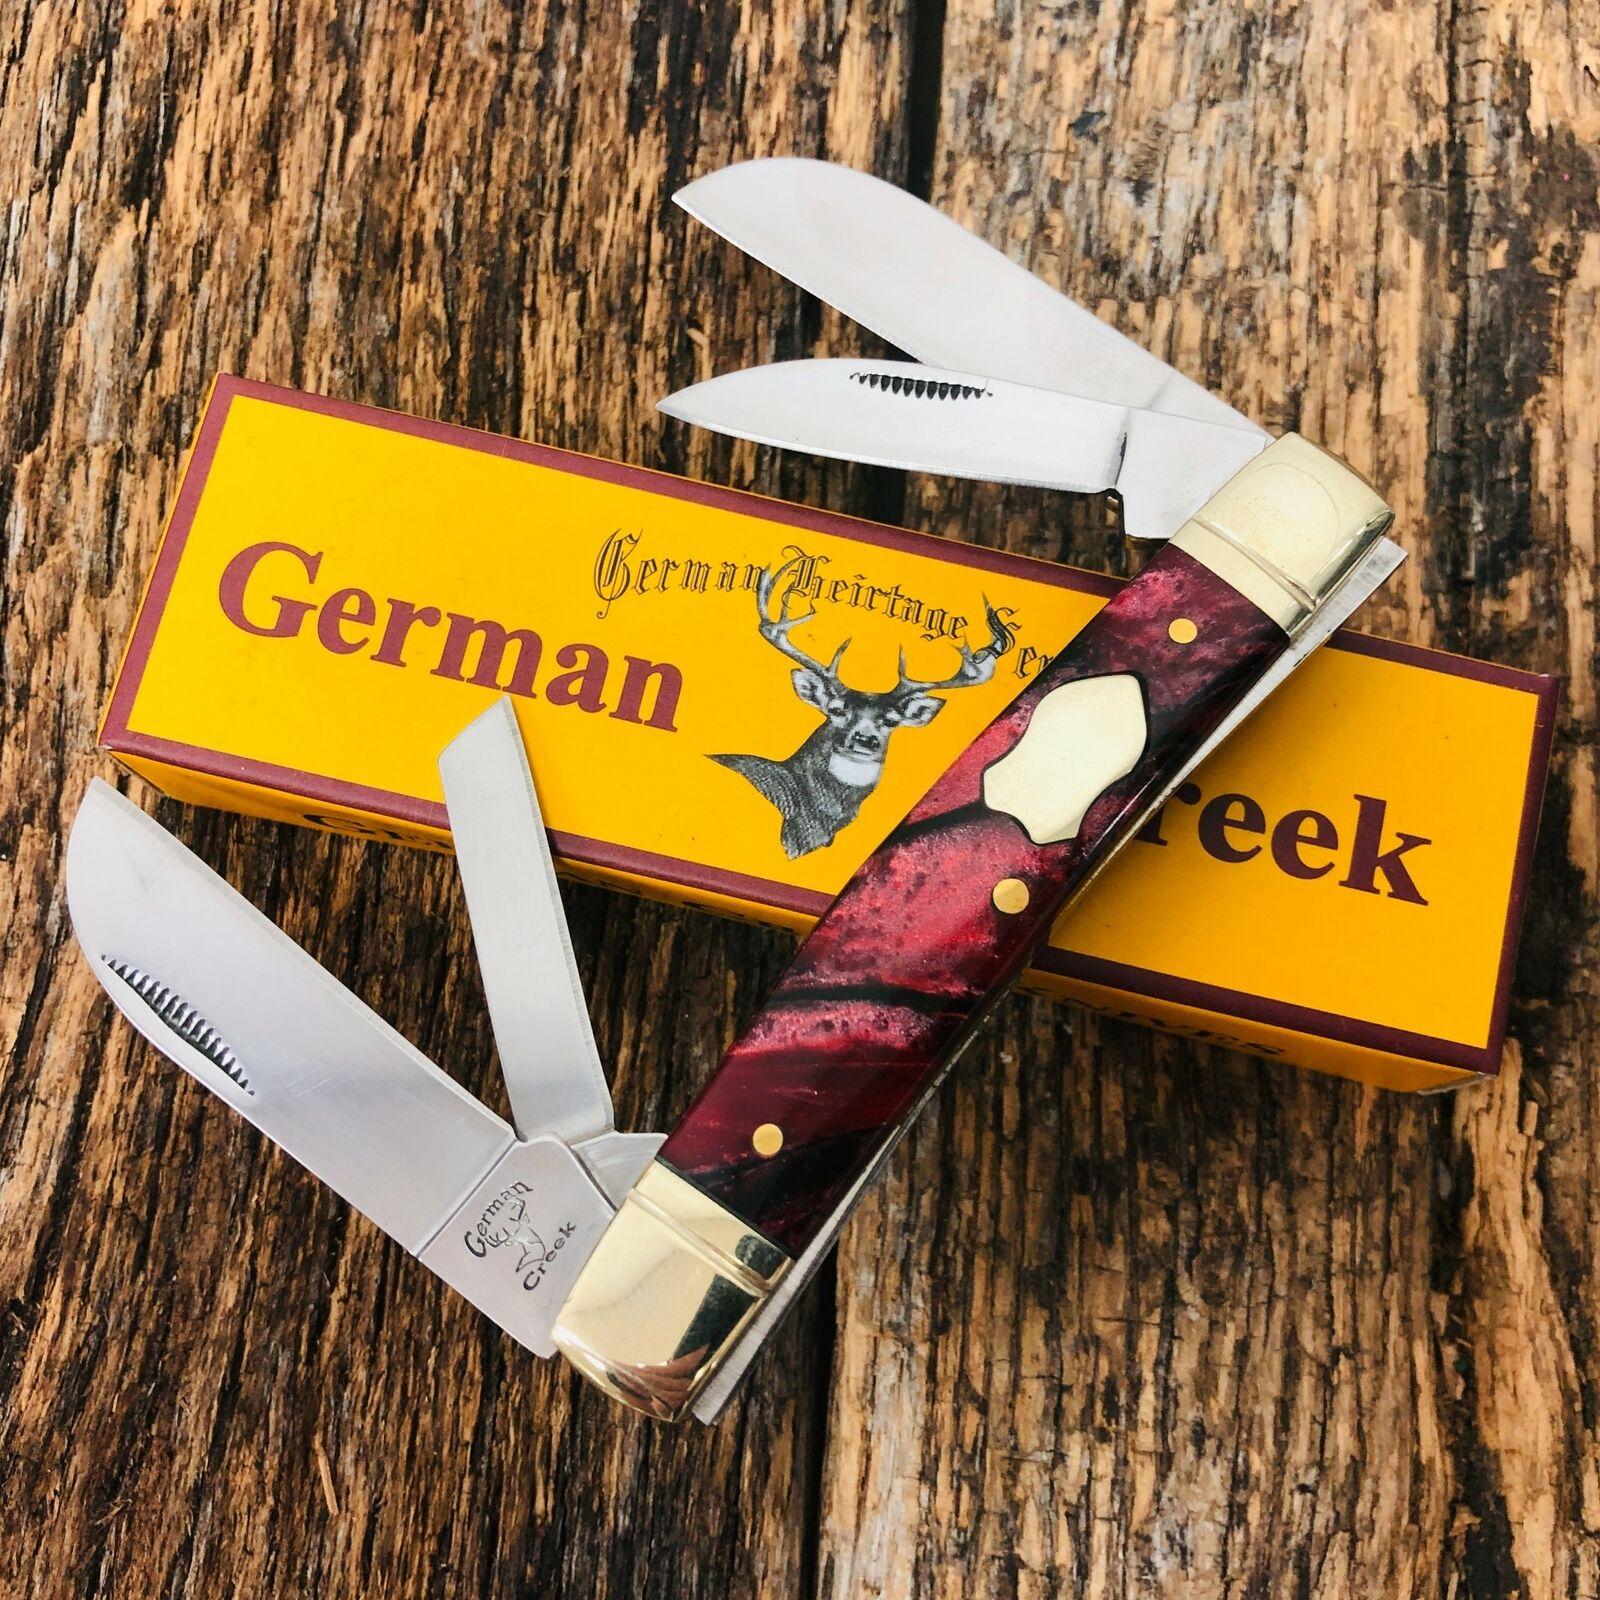 GERMAN CREEK 3 5/8″ Congress Pocket Knife 4 Blades, Brand New RED SWIRL a